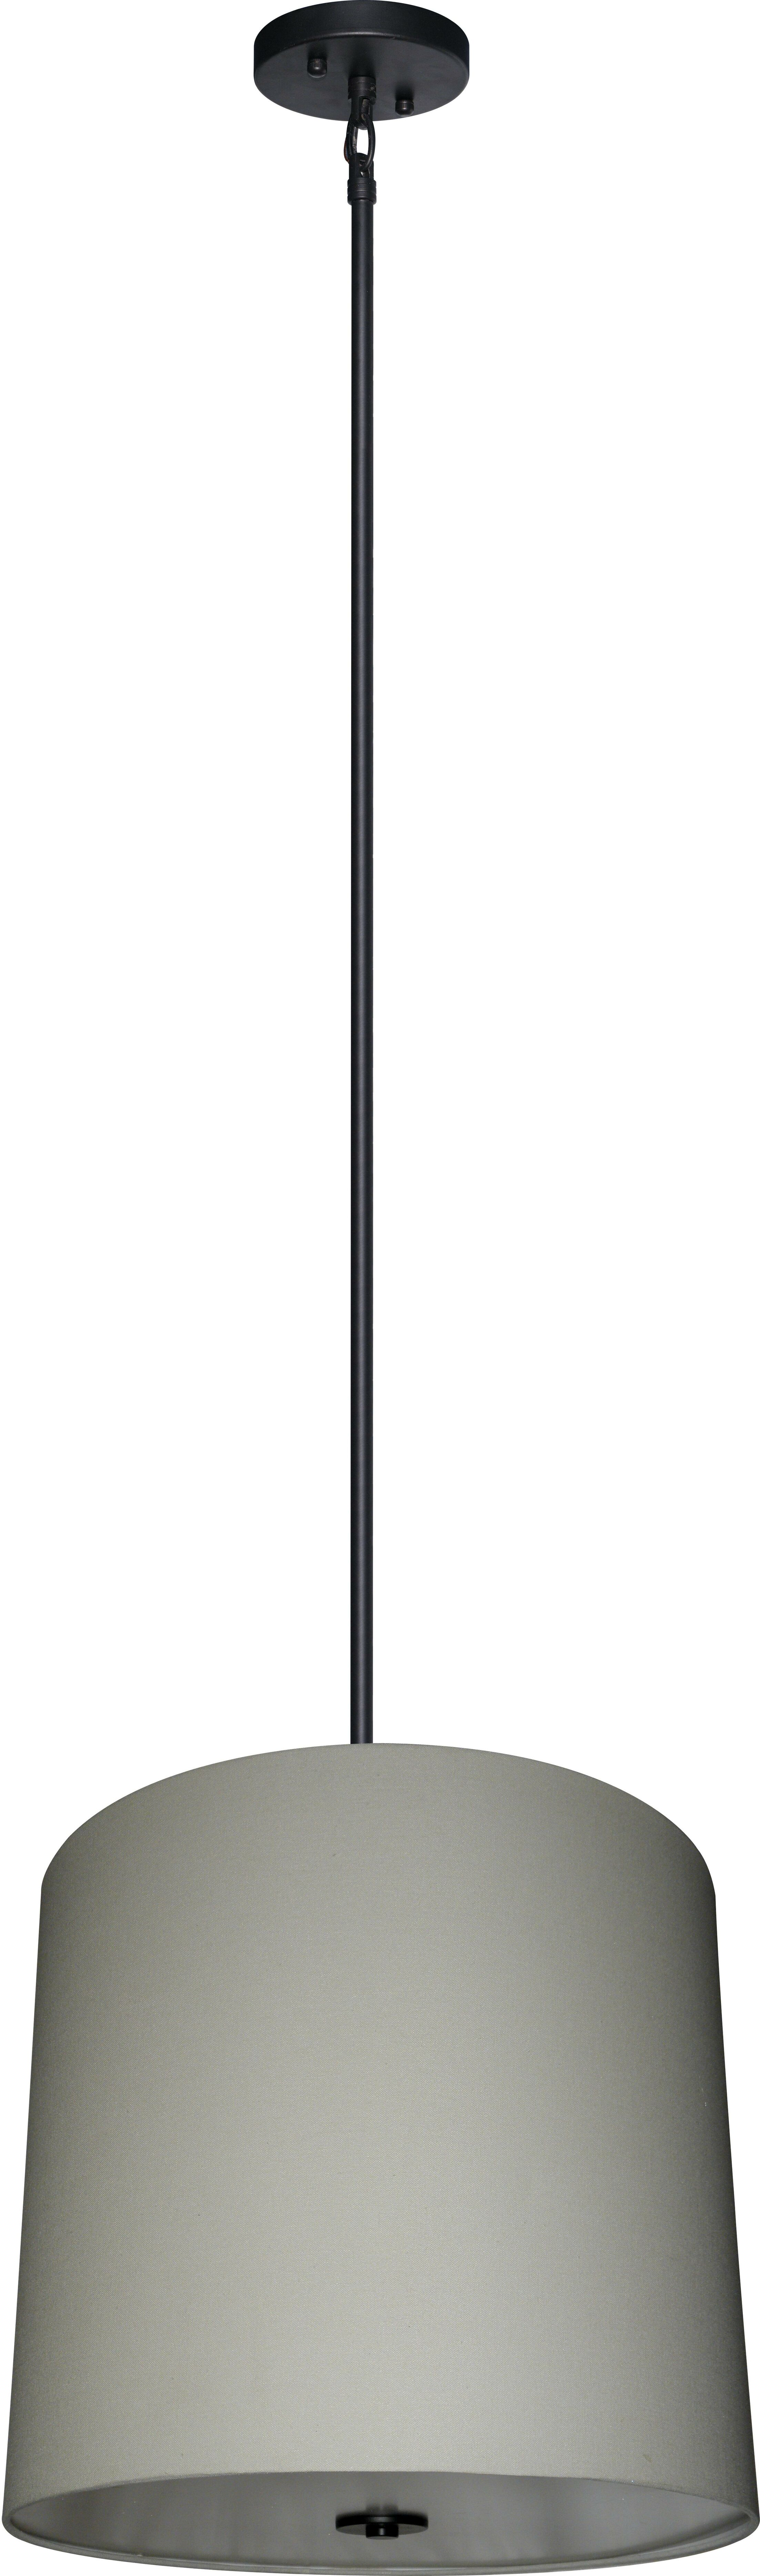 Olivo 5-Light Shaded Chandelier Shade Color: Creme Brulee Weave